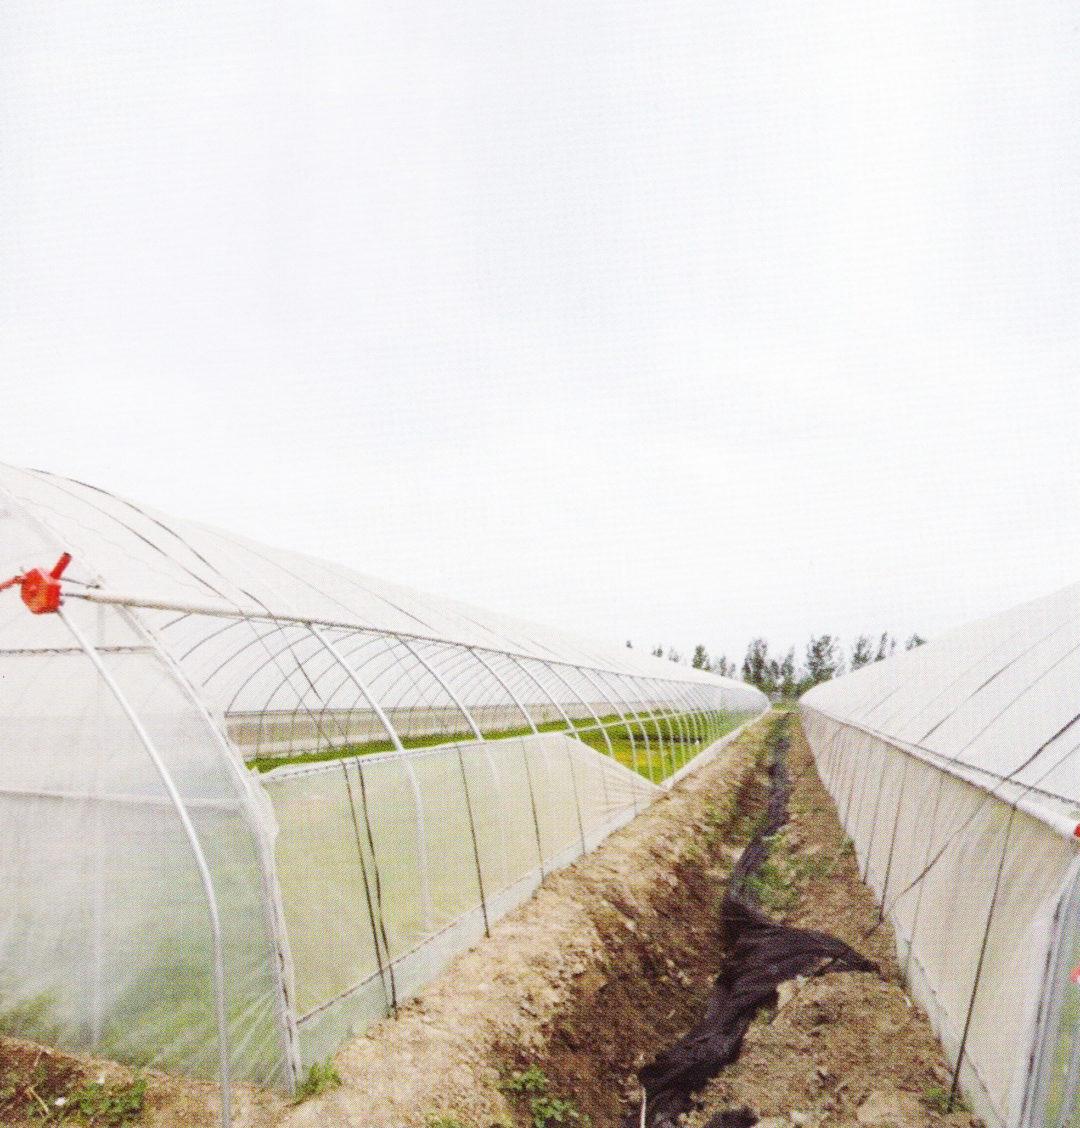 Film Greenhouse Drainage